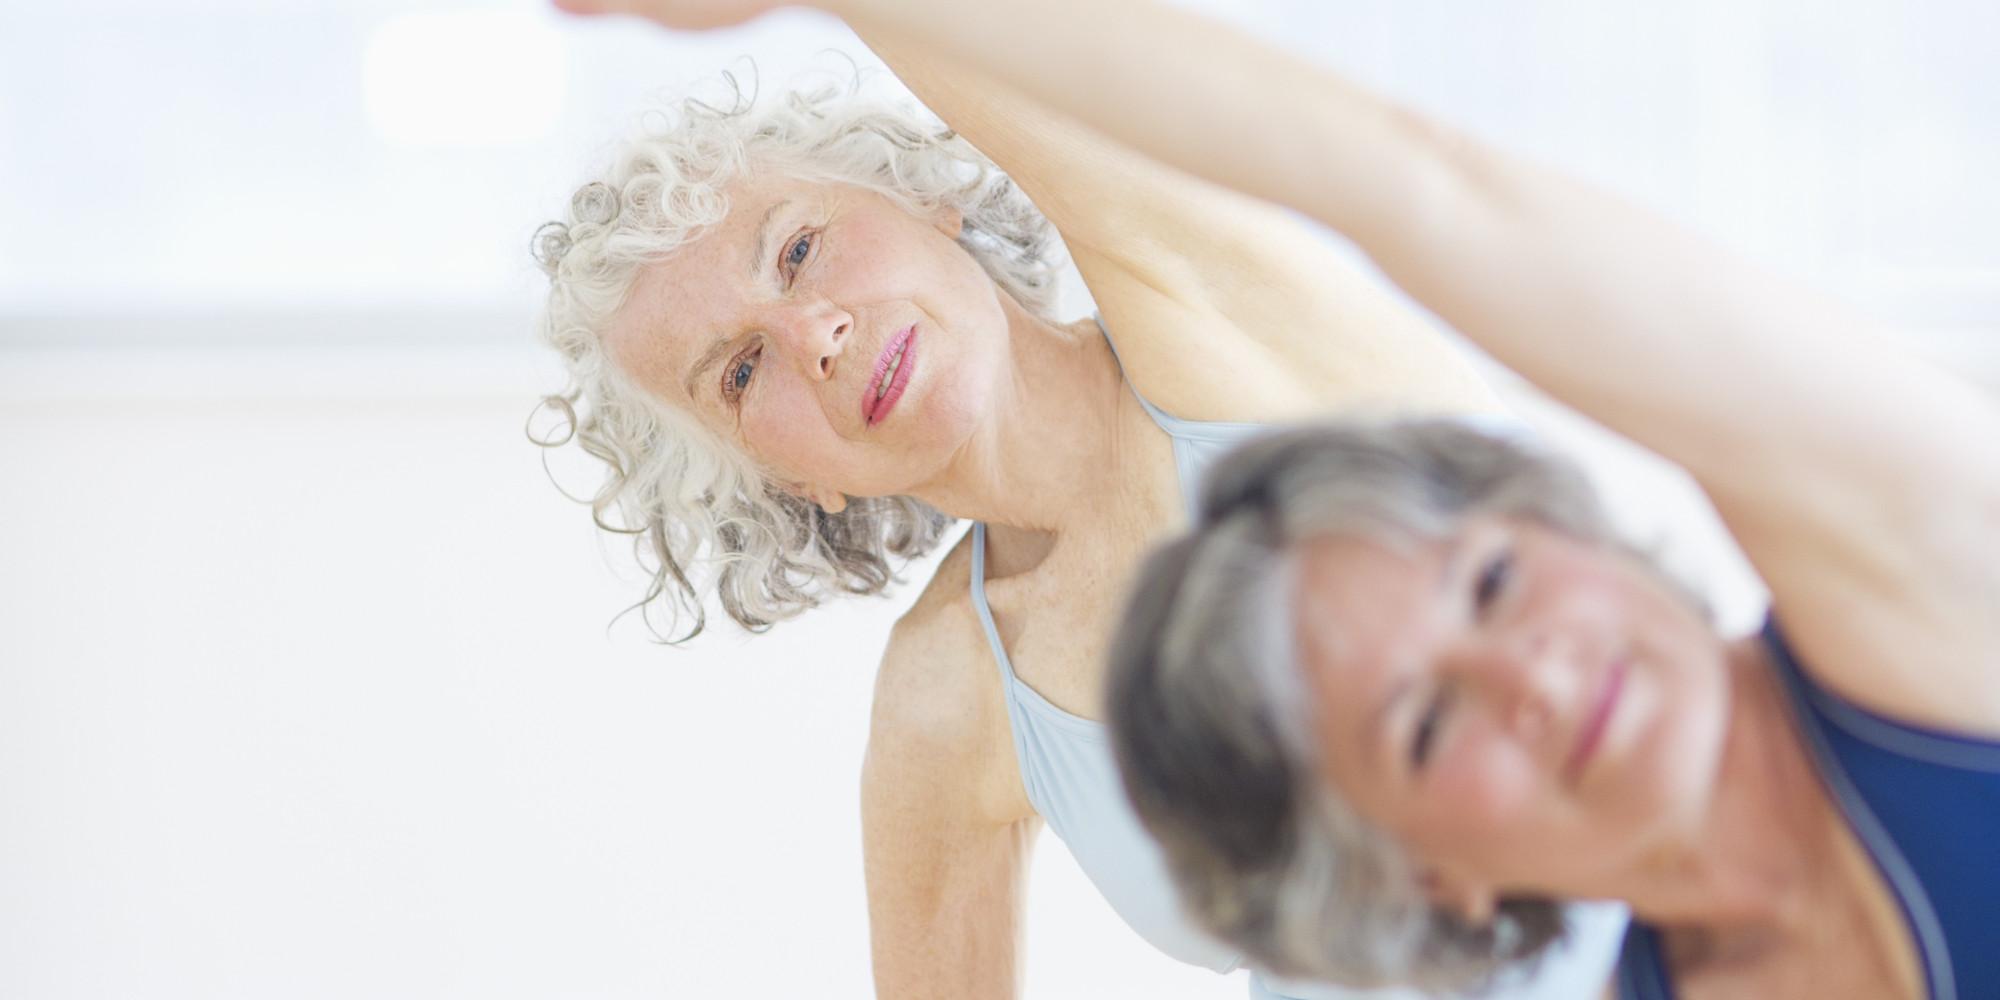 OLDER-PERSON-YOGA-BE YOGA STUDIO - Yoga for senior - yoga for eldre